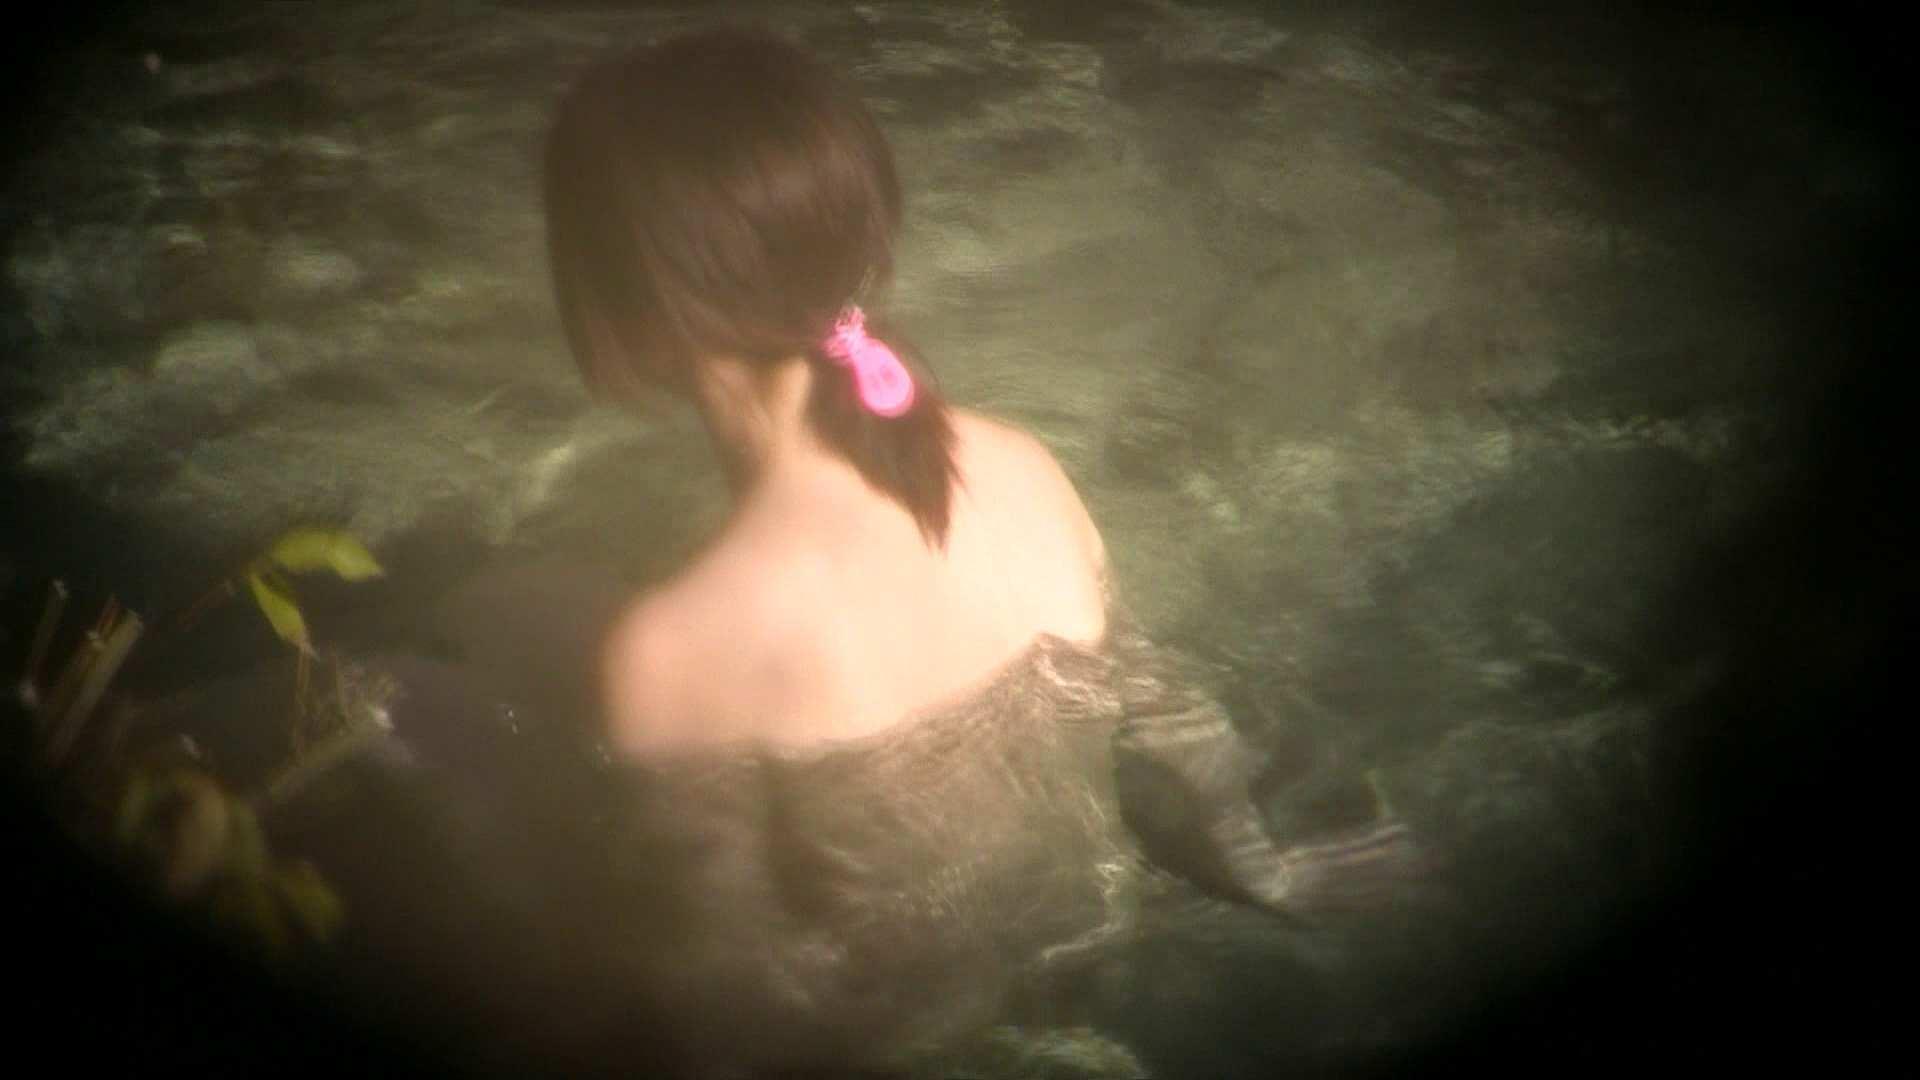 Aquaな露天風呂Vol.698 盗撮師作品   露天風呂突入  104pic 58